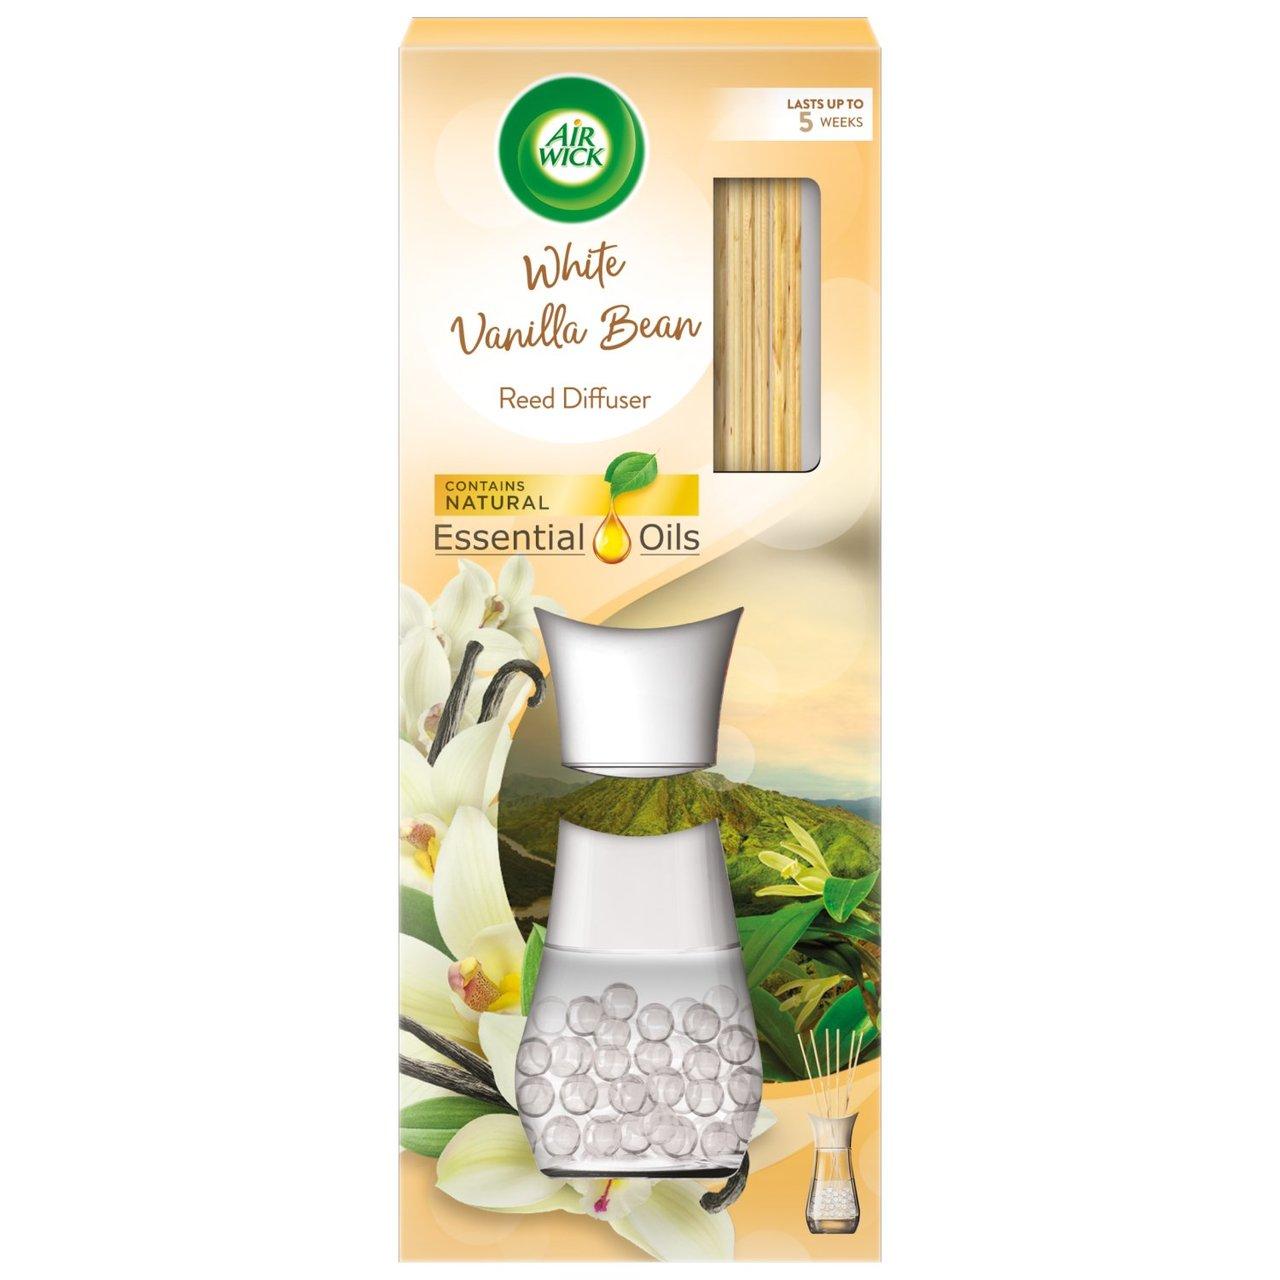 Air Wick White Vanilla Bean Reed Diffuser 33ml - £4.00 @ morrisons